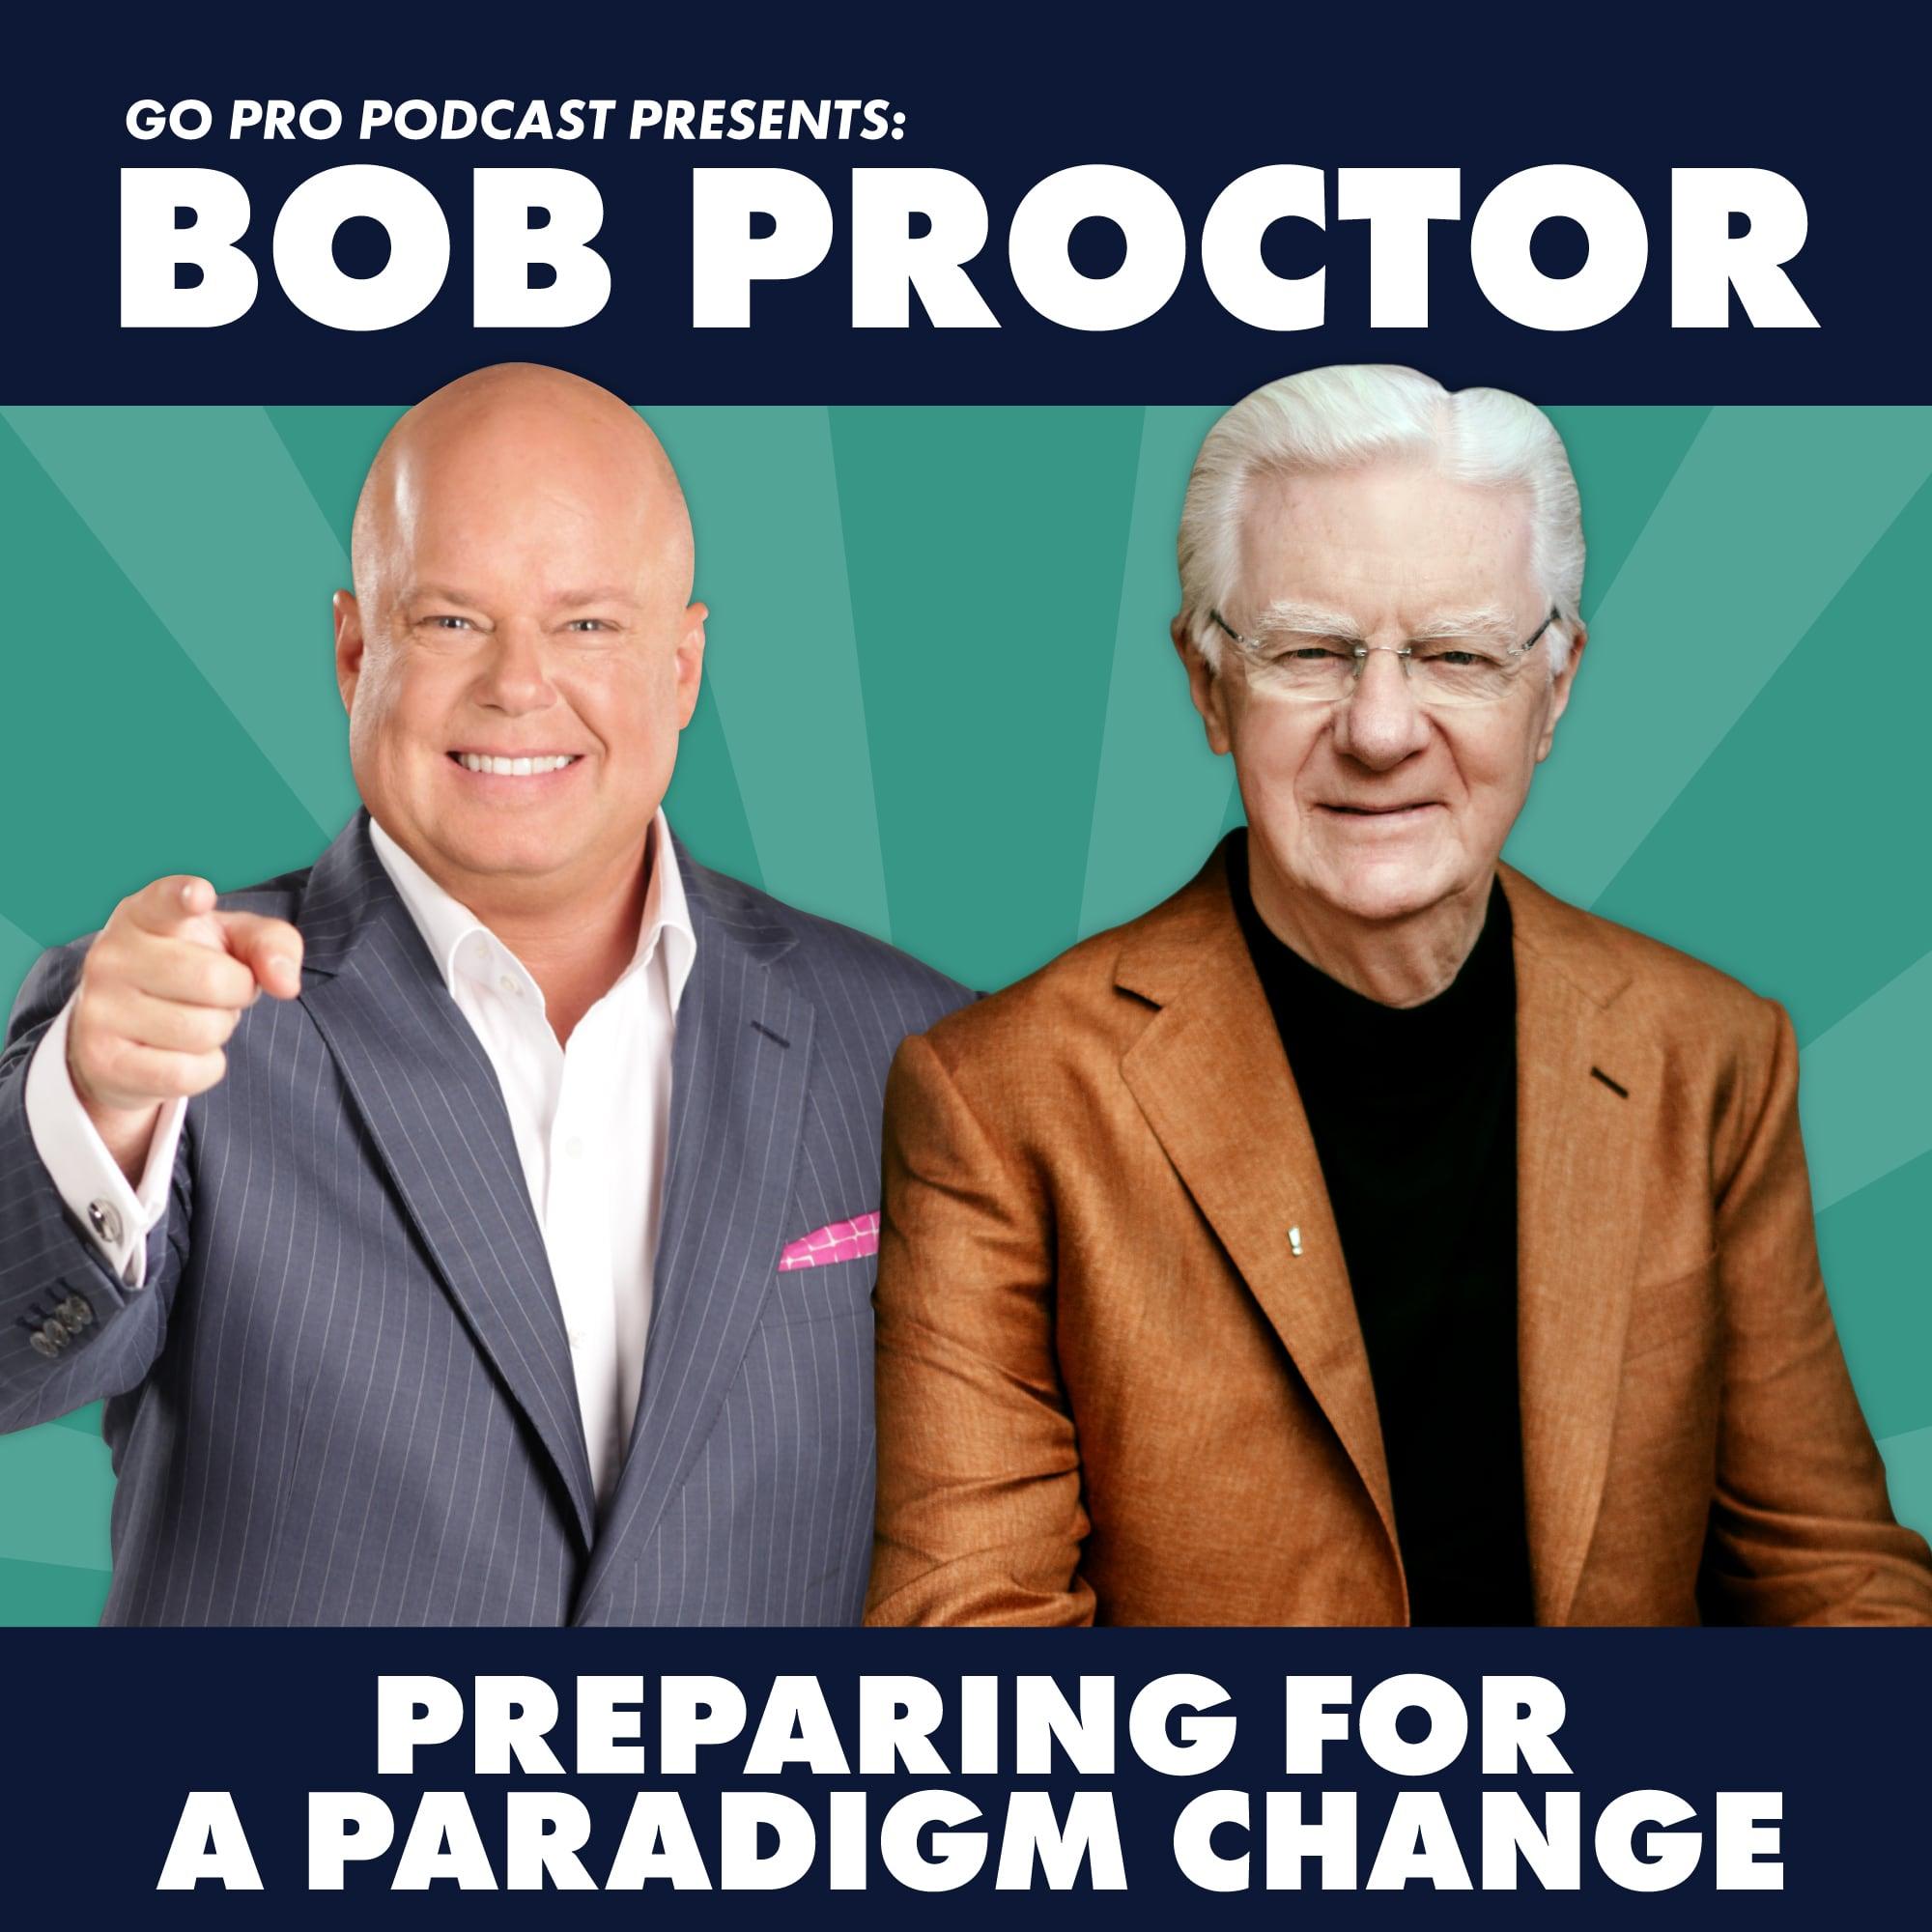 Bob Proctor: Preparing for a Paradigm Change